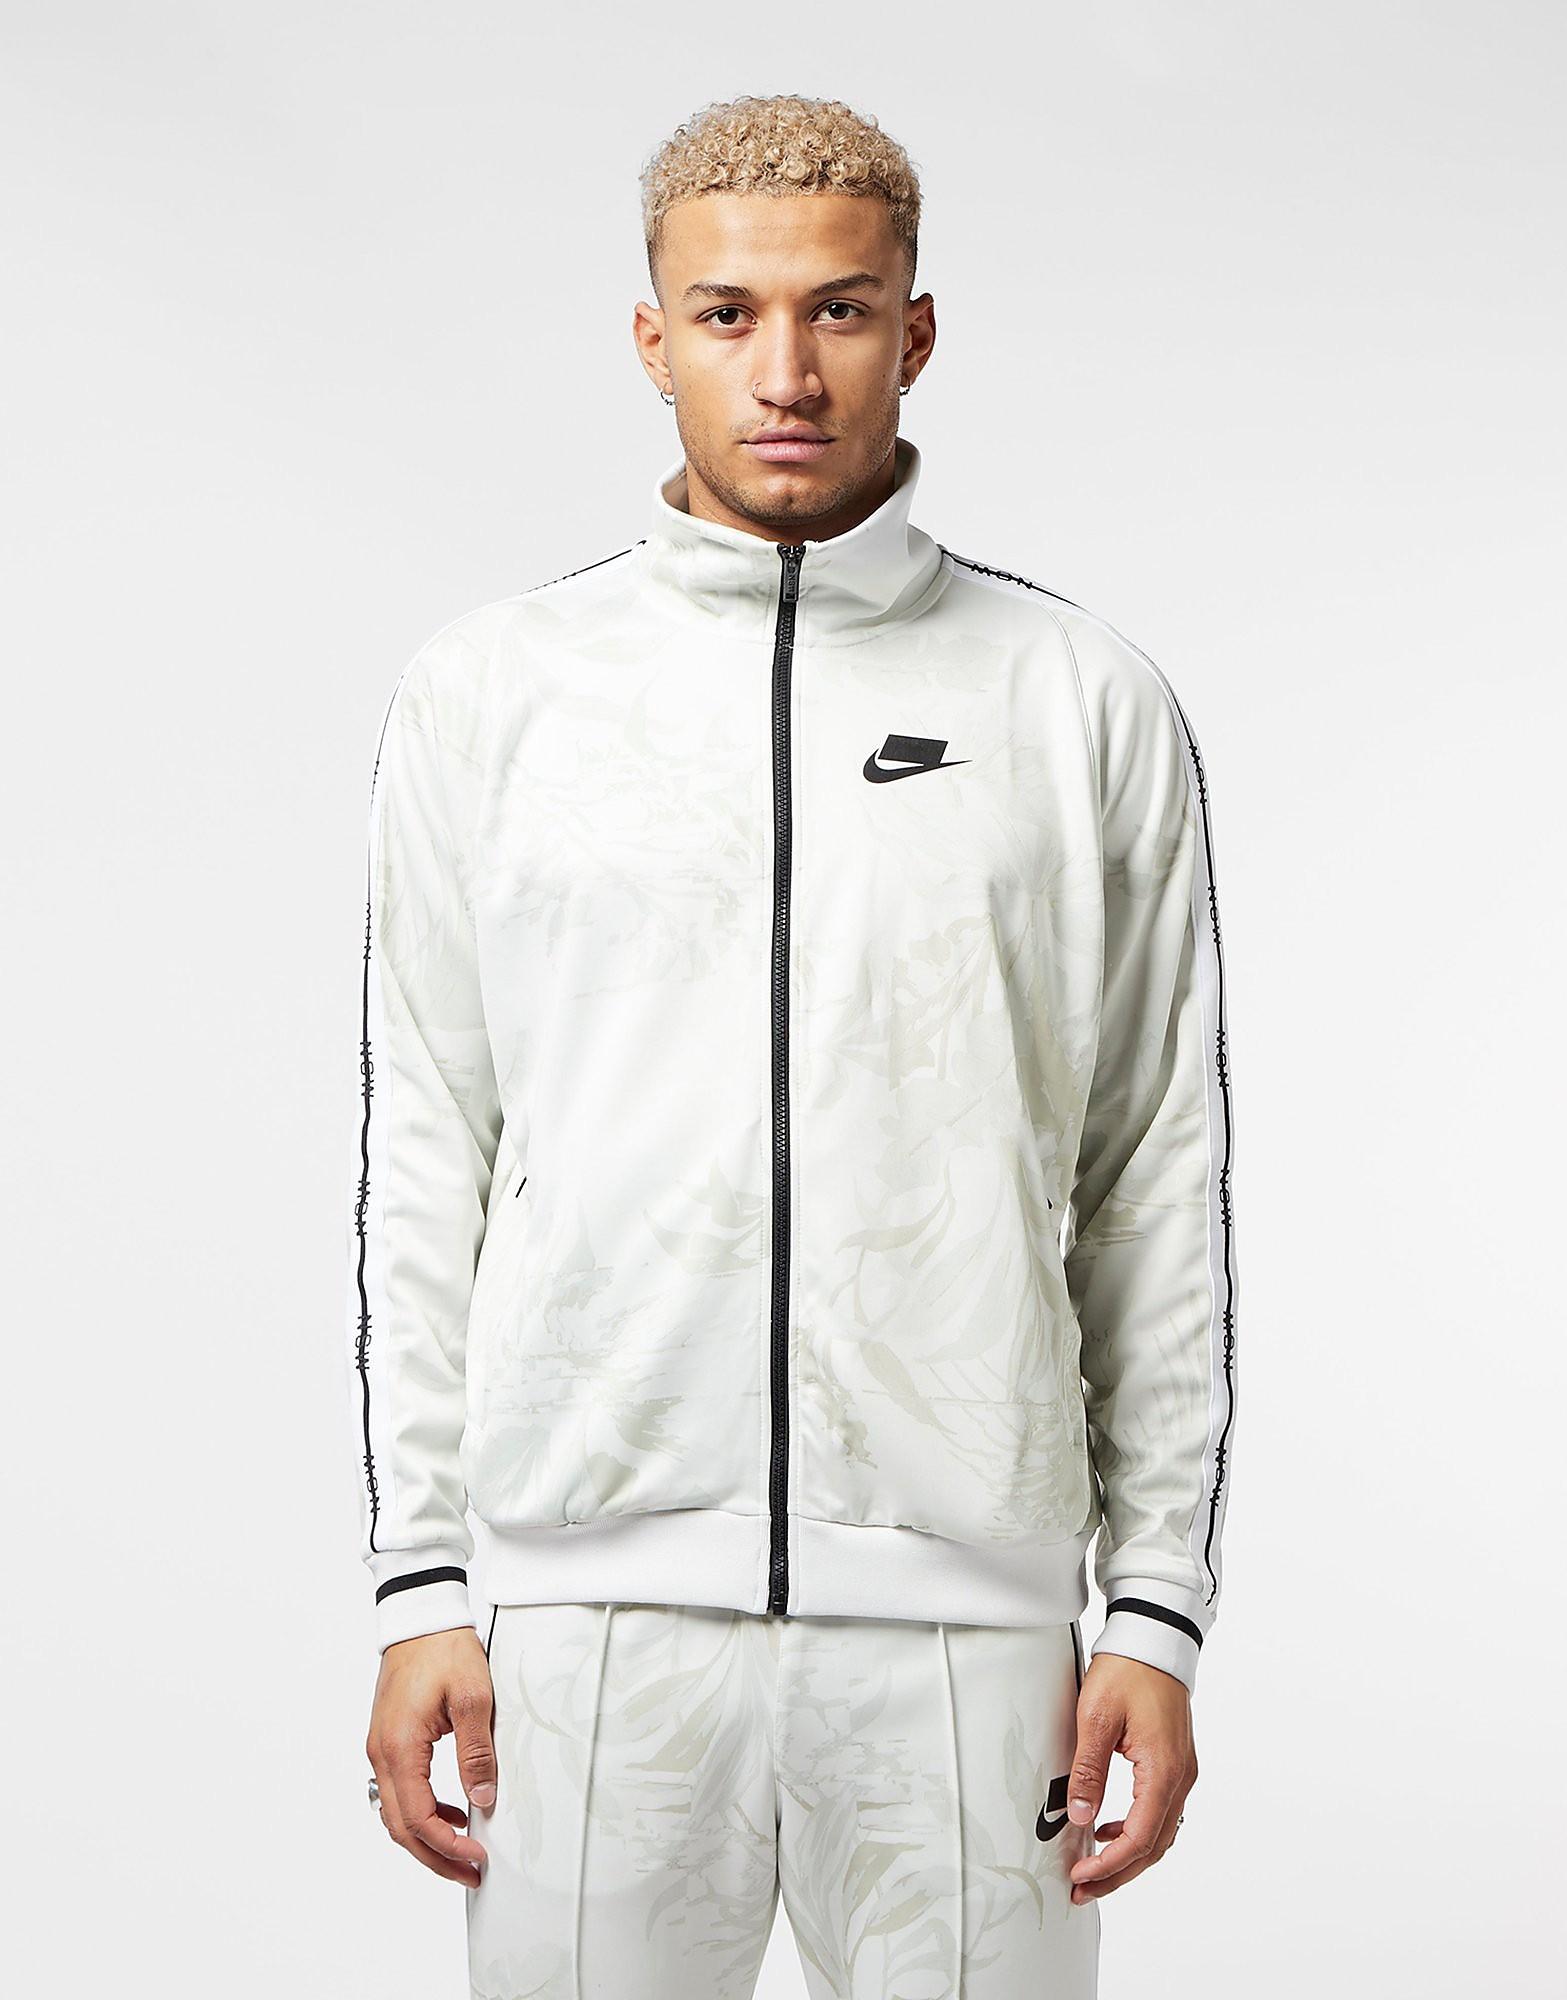 Nike Sportswear All Over Print Track Top